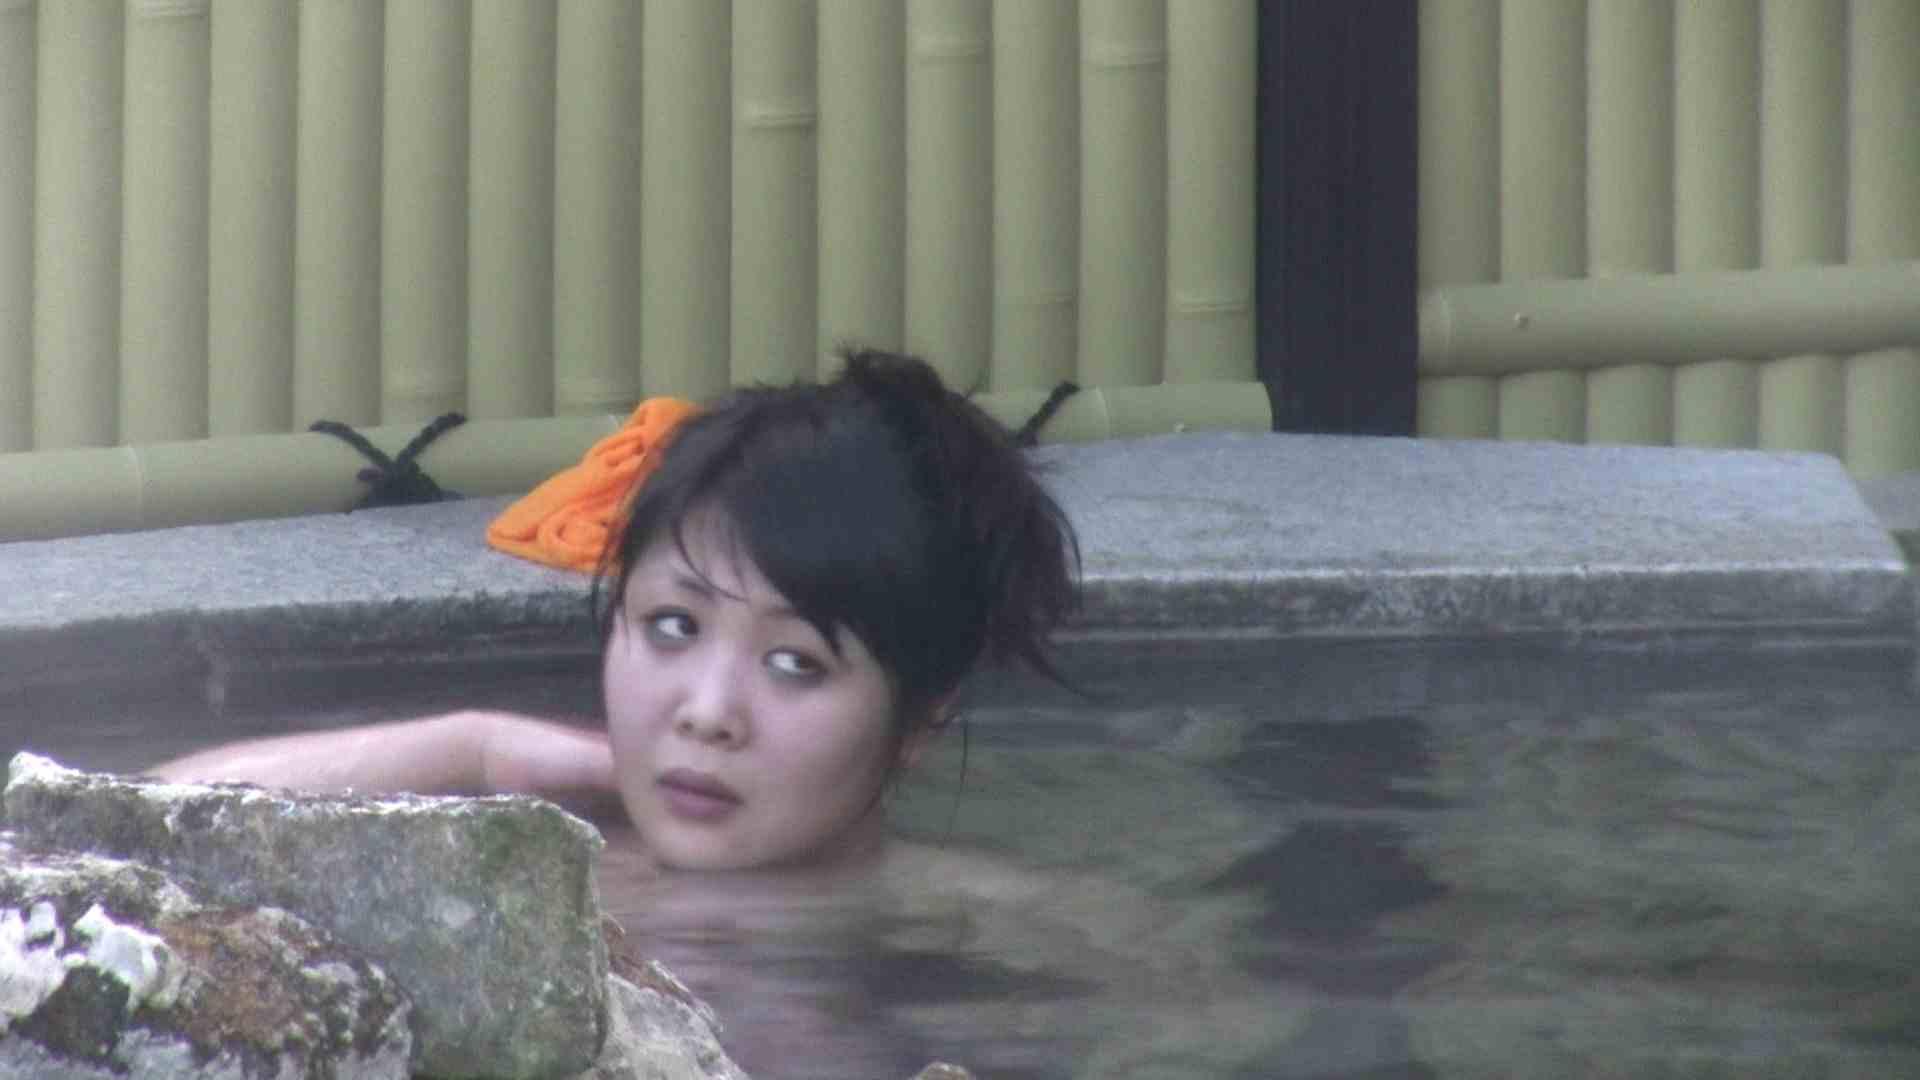 Aquaな露天風呂Vol.118 OL女体 | 露天  68連発 19